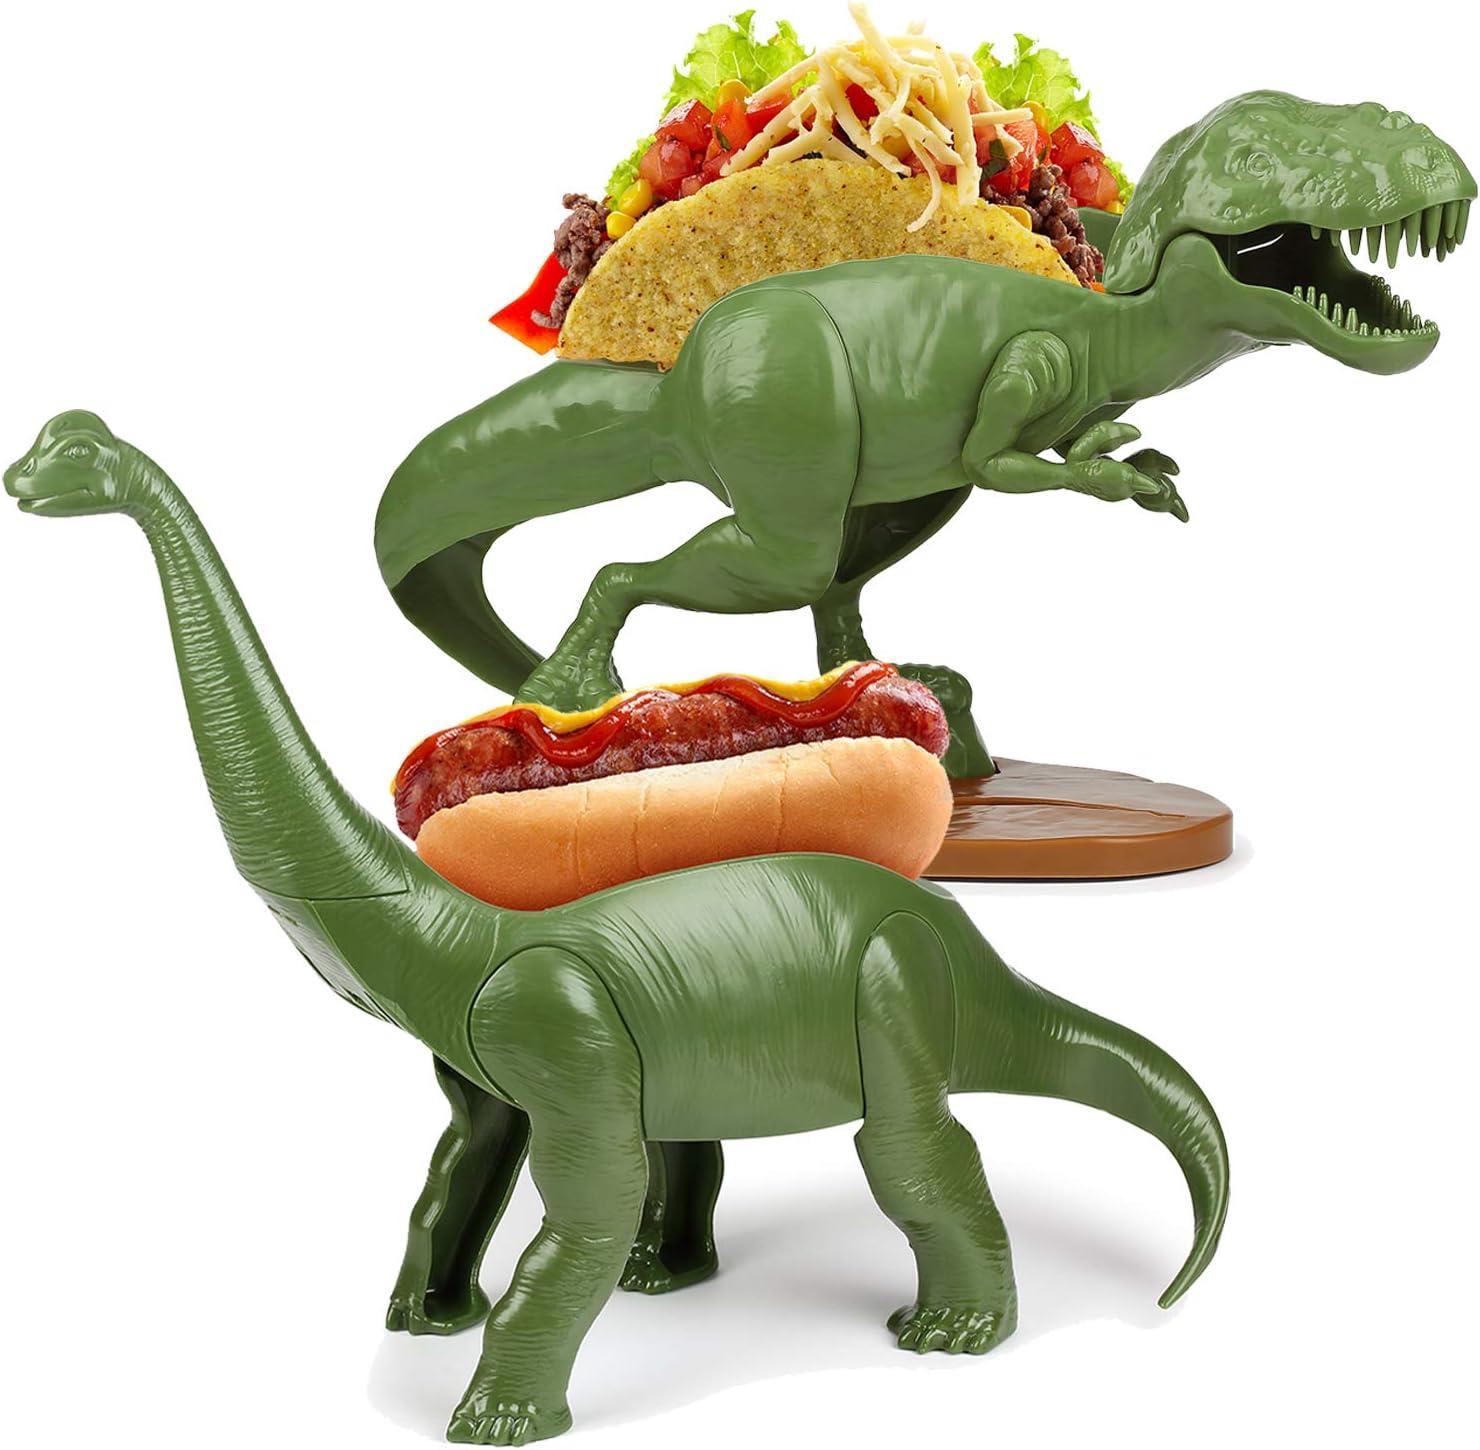 T-Rex Dinosaur Taco Stand and Brachiosaurus Hotdog Holder - Funwares Tacosaurus and Weeniesaurus Novelty Food Stands